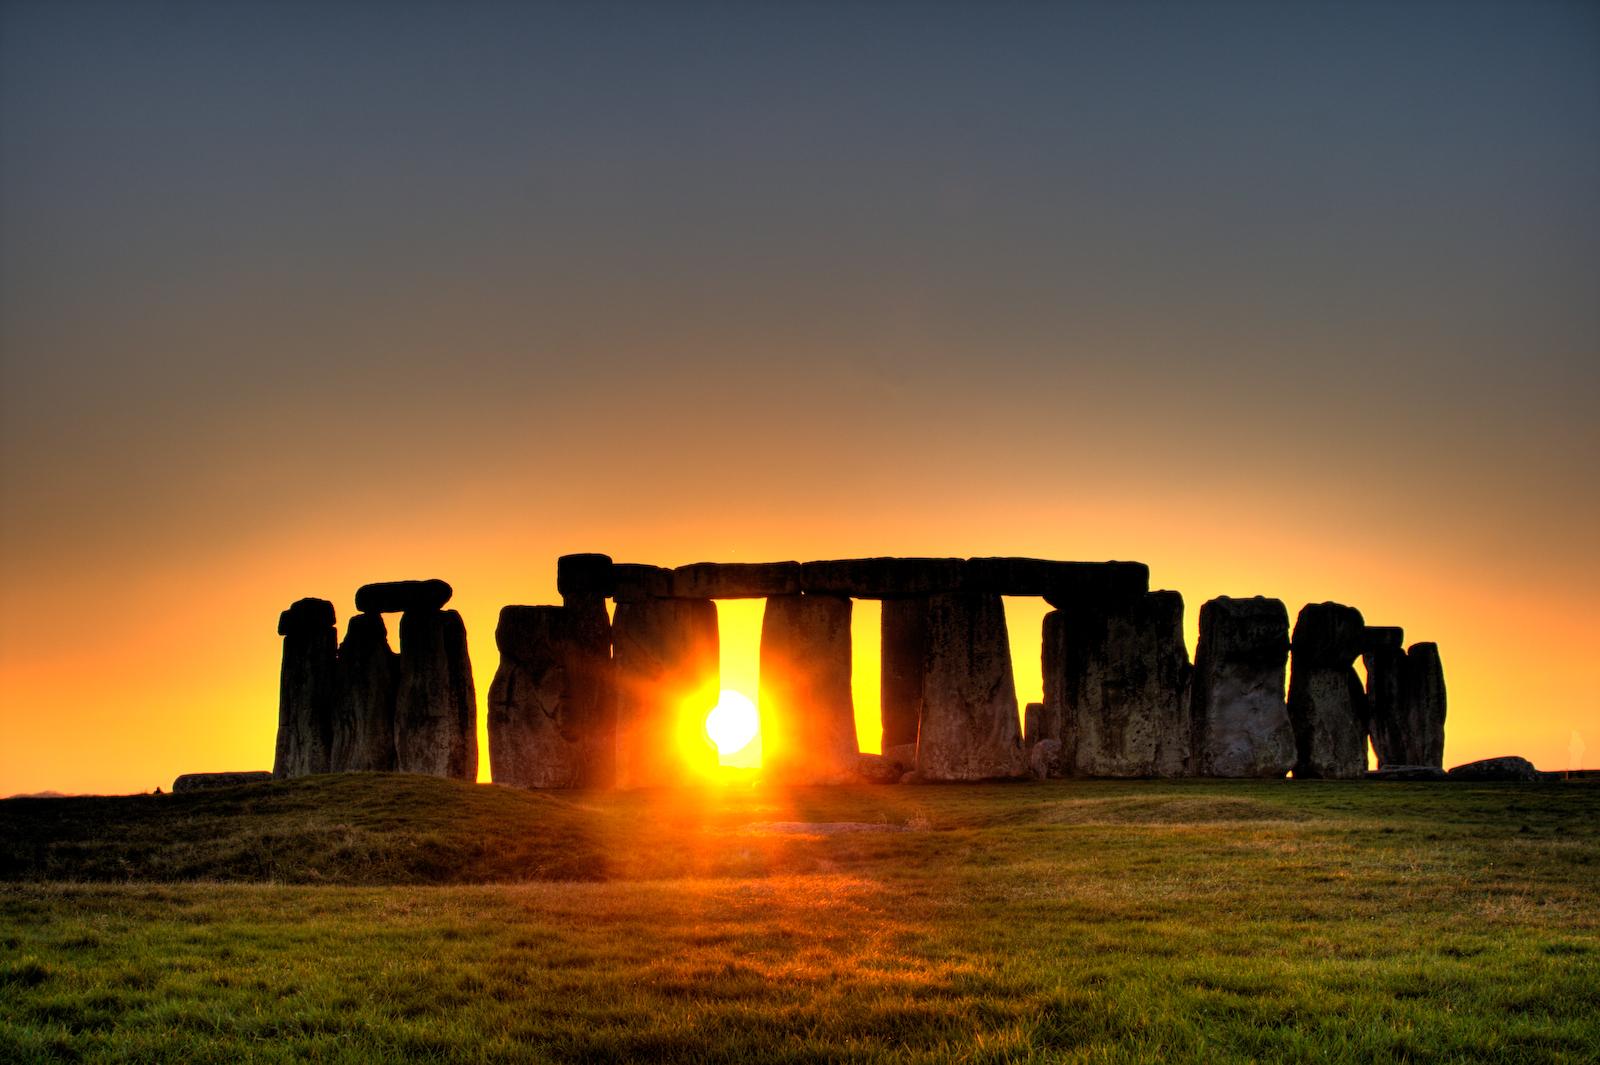 stonehenge dimensions